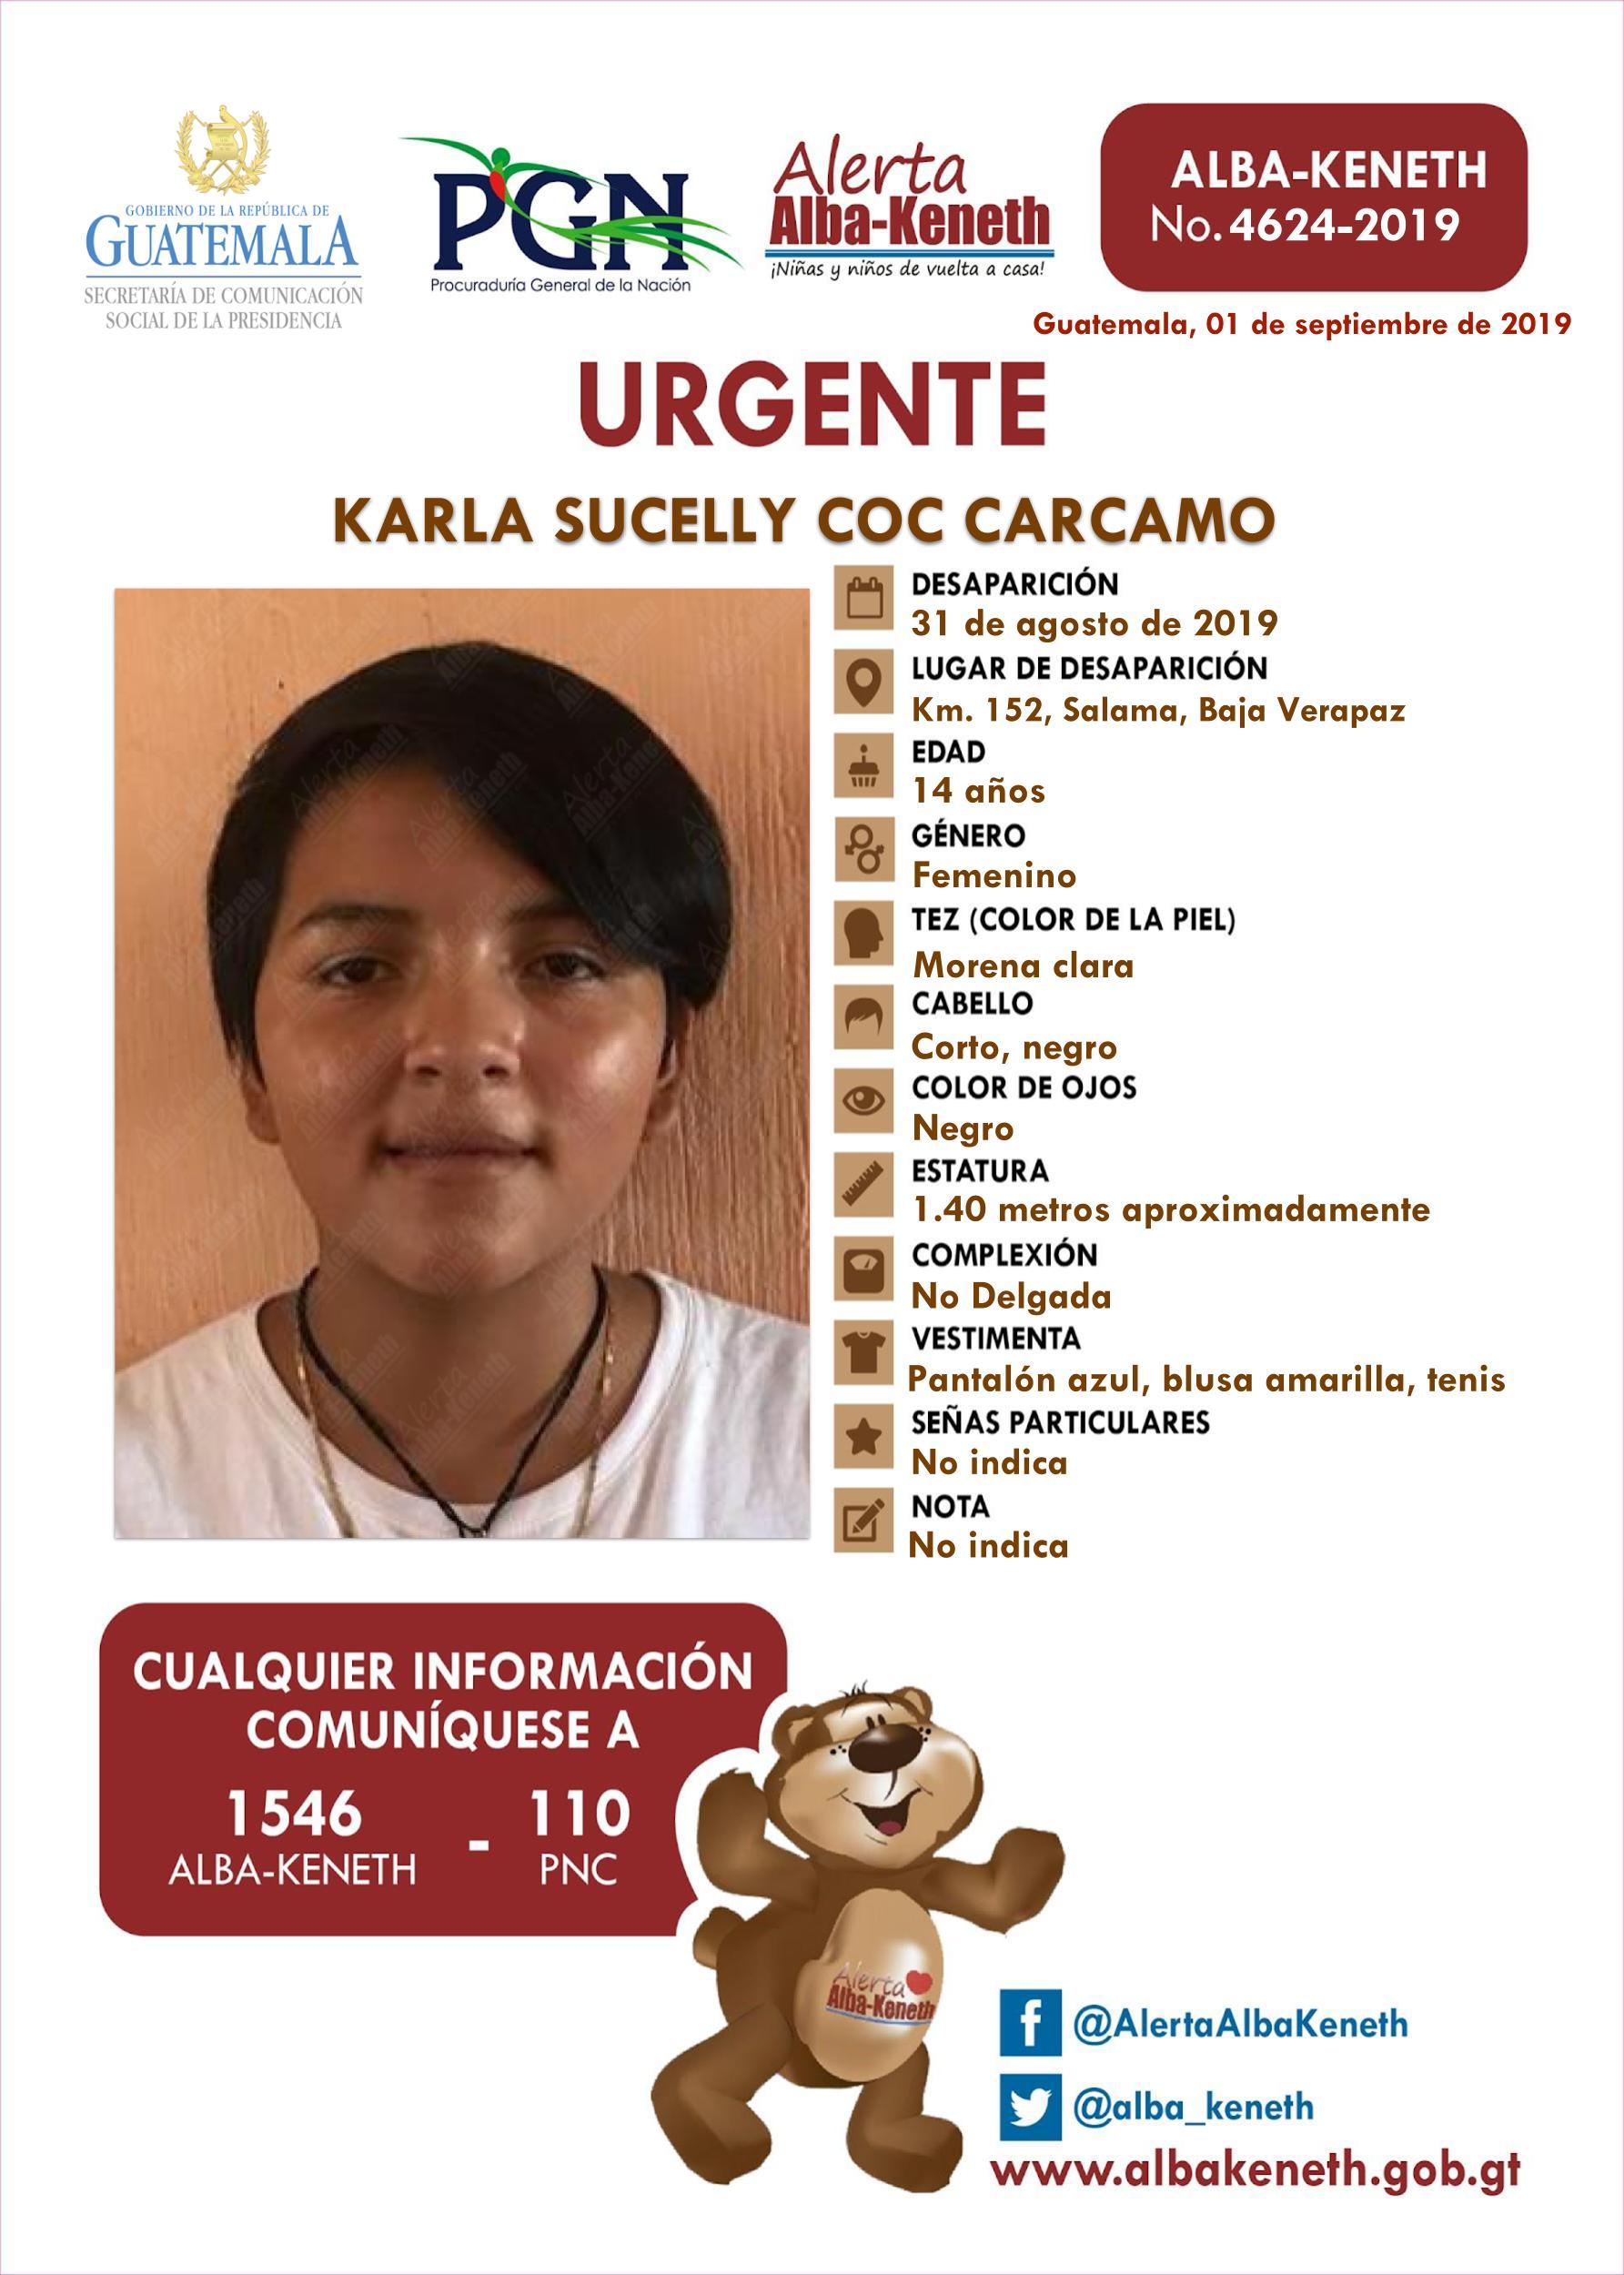 Karla Sucelly Coc Carcamo